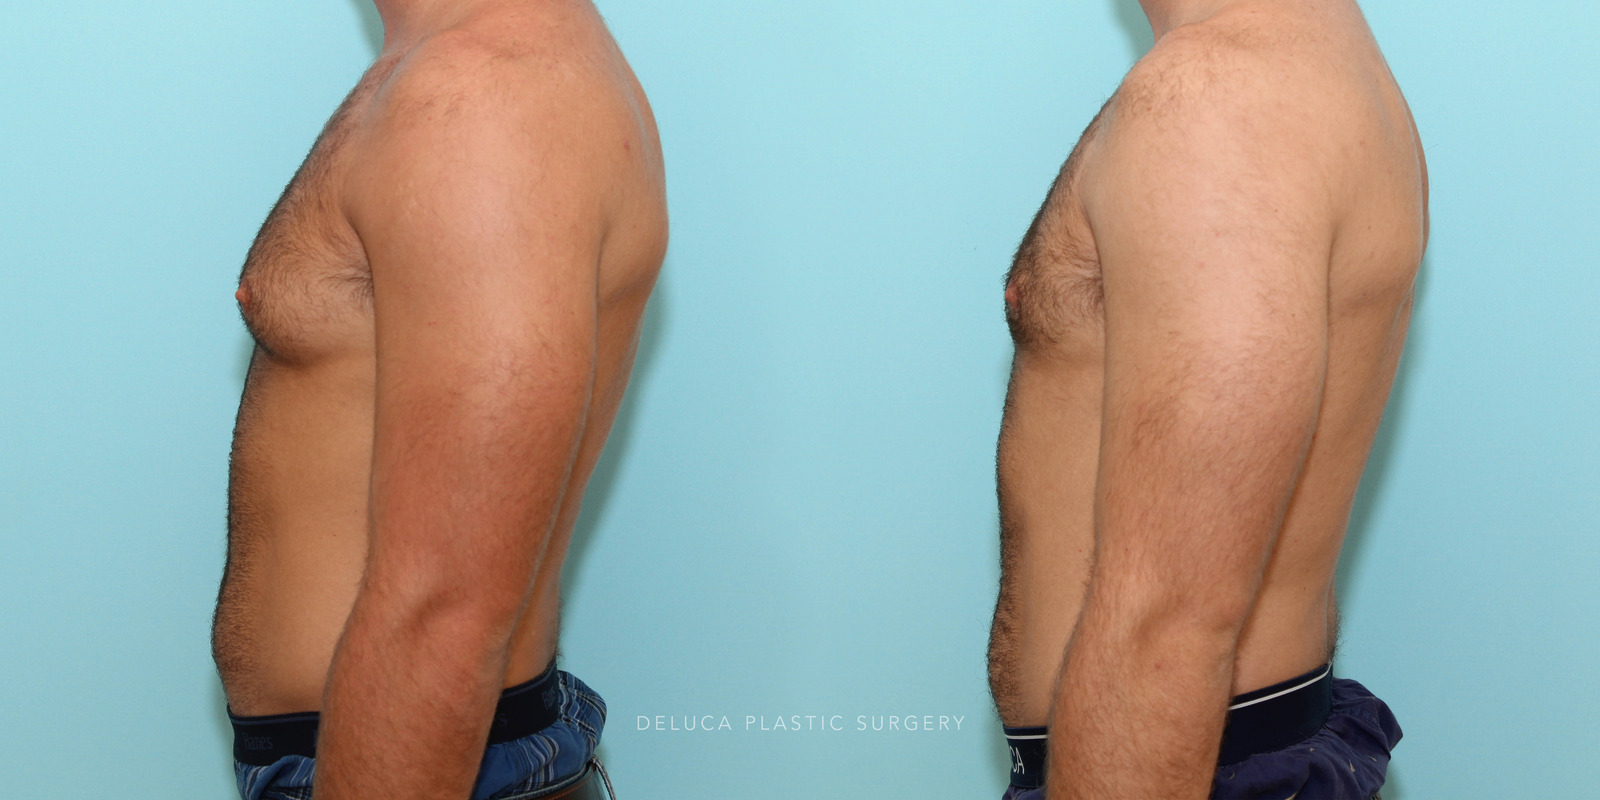 21 year old Correction of Gynecomastia Using Liposuction and Subcutaneous Mastectomy